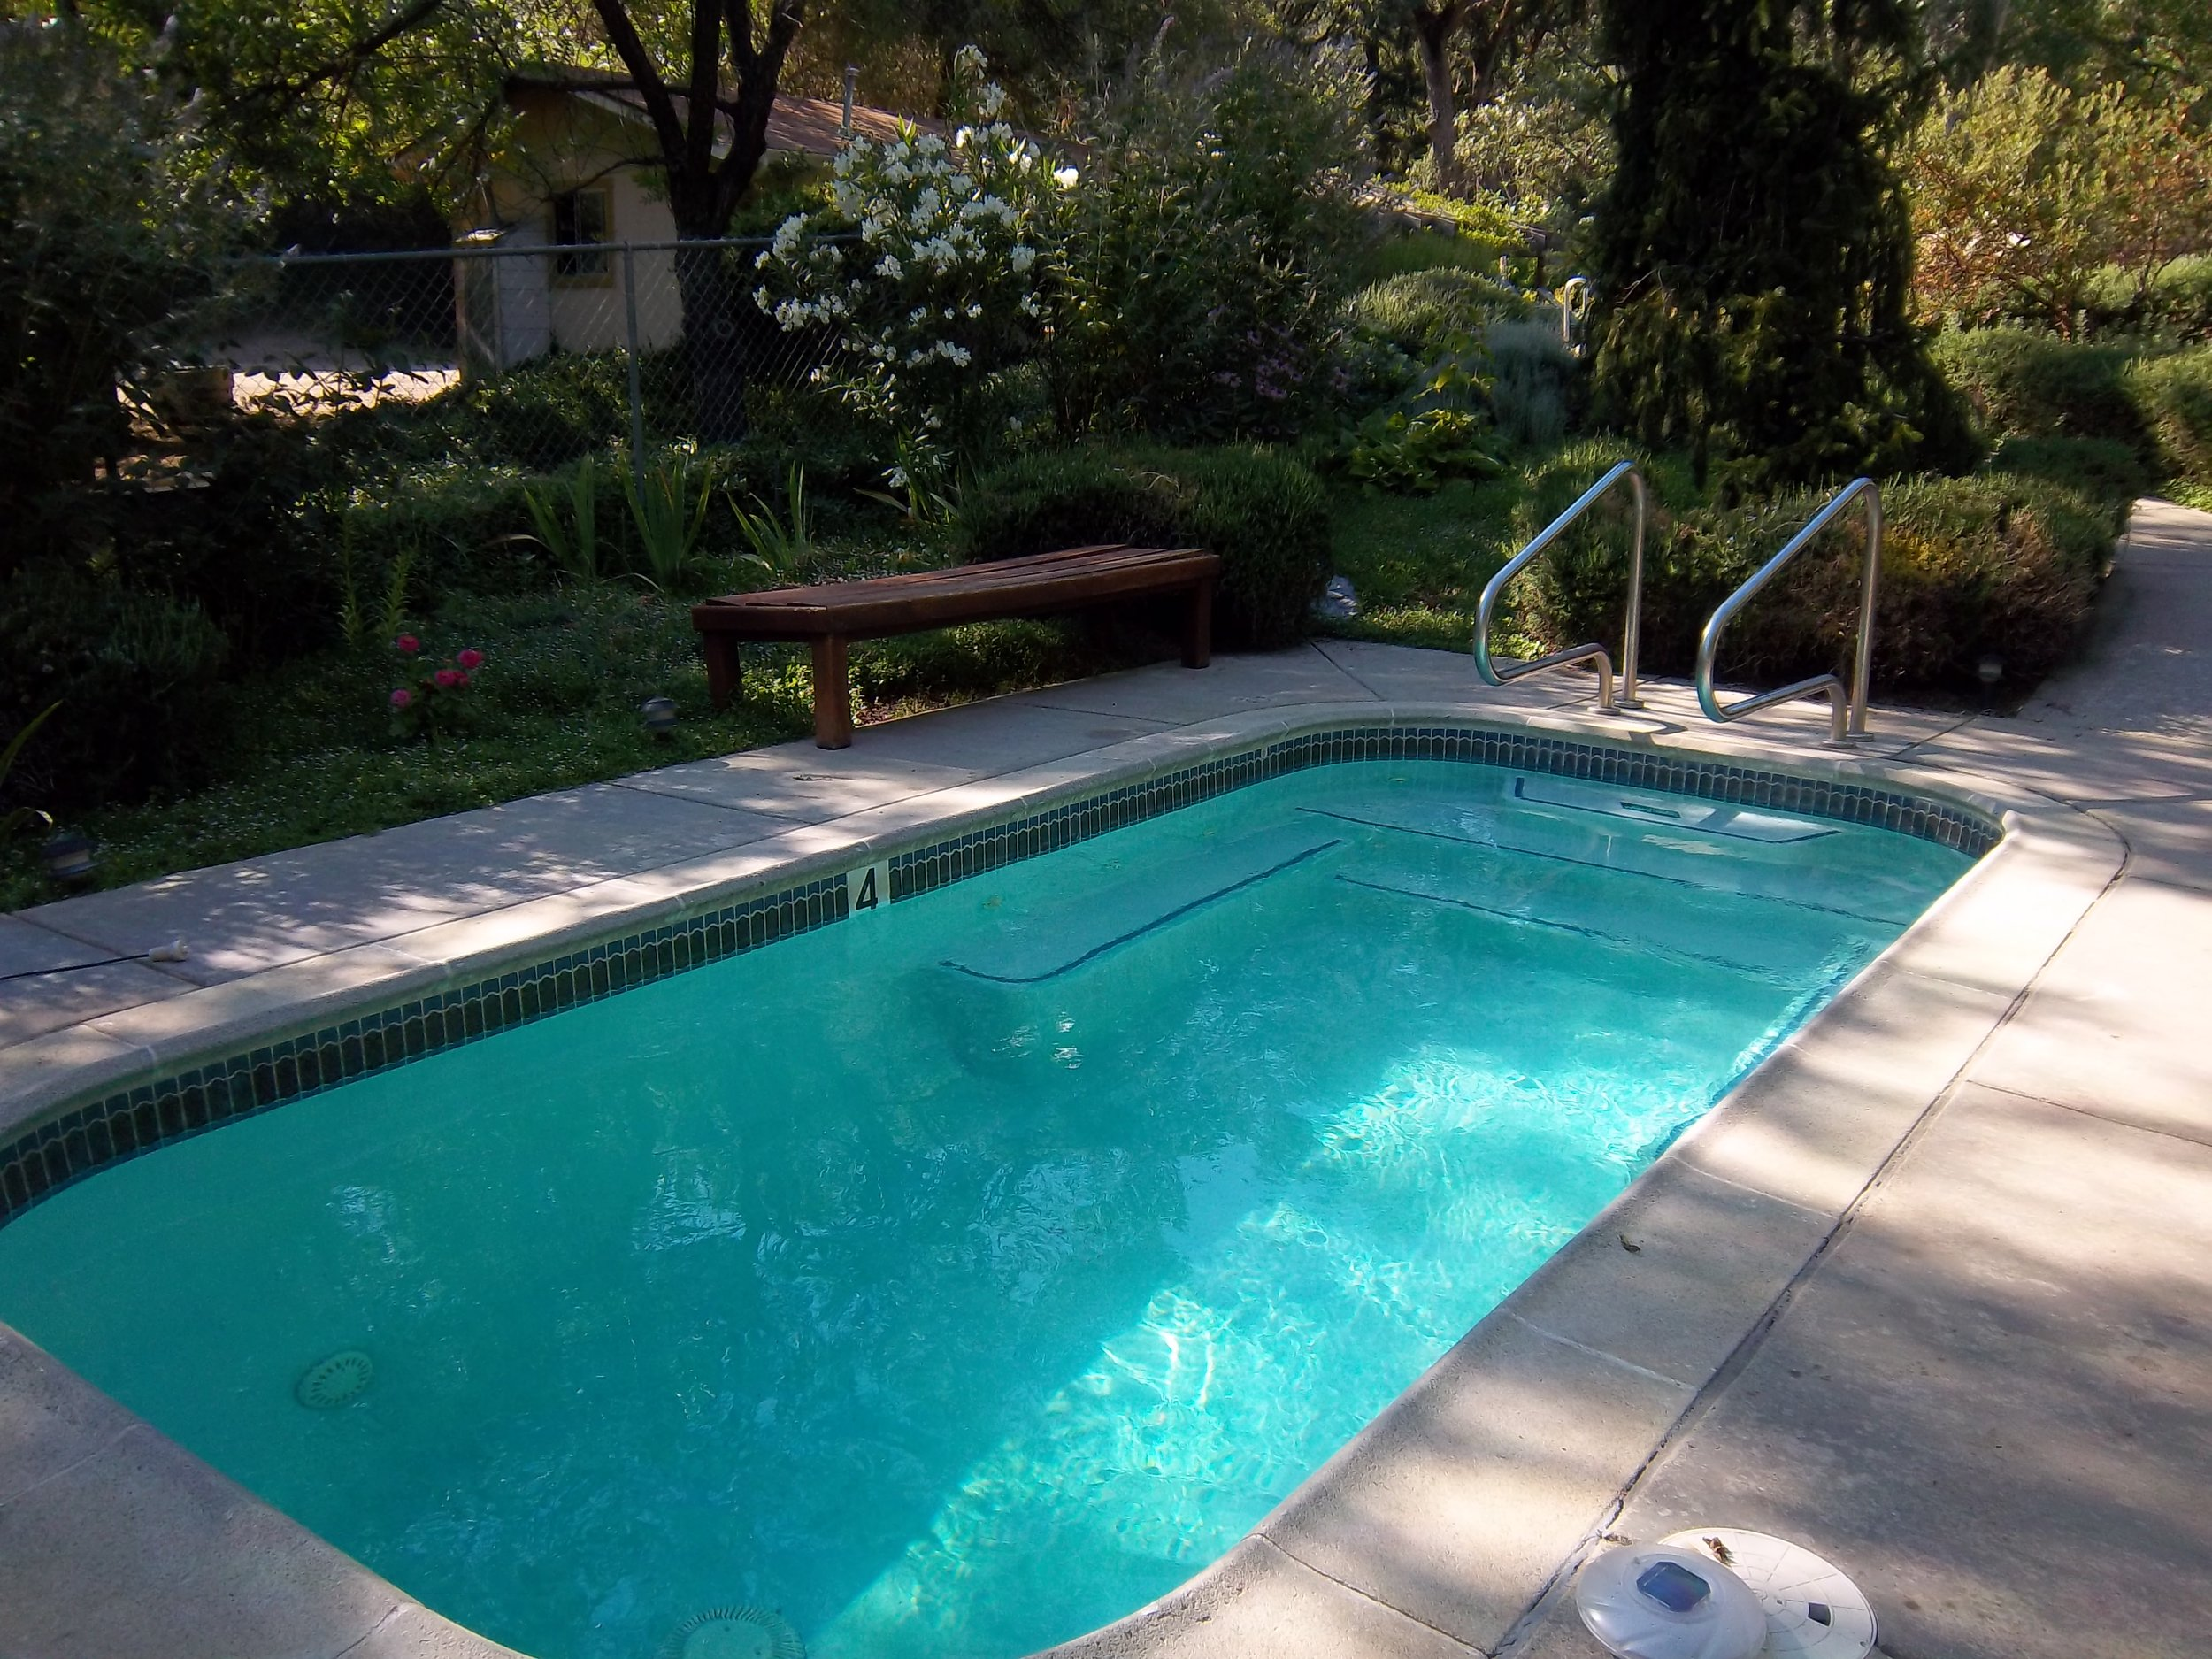 Saratoga Hot Tub.JPG